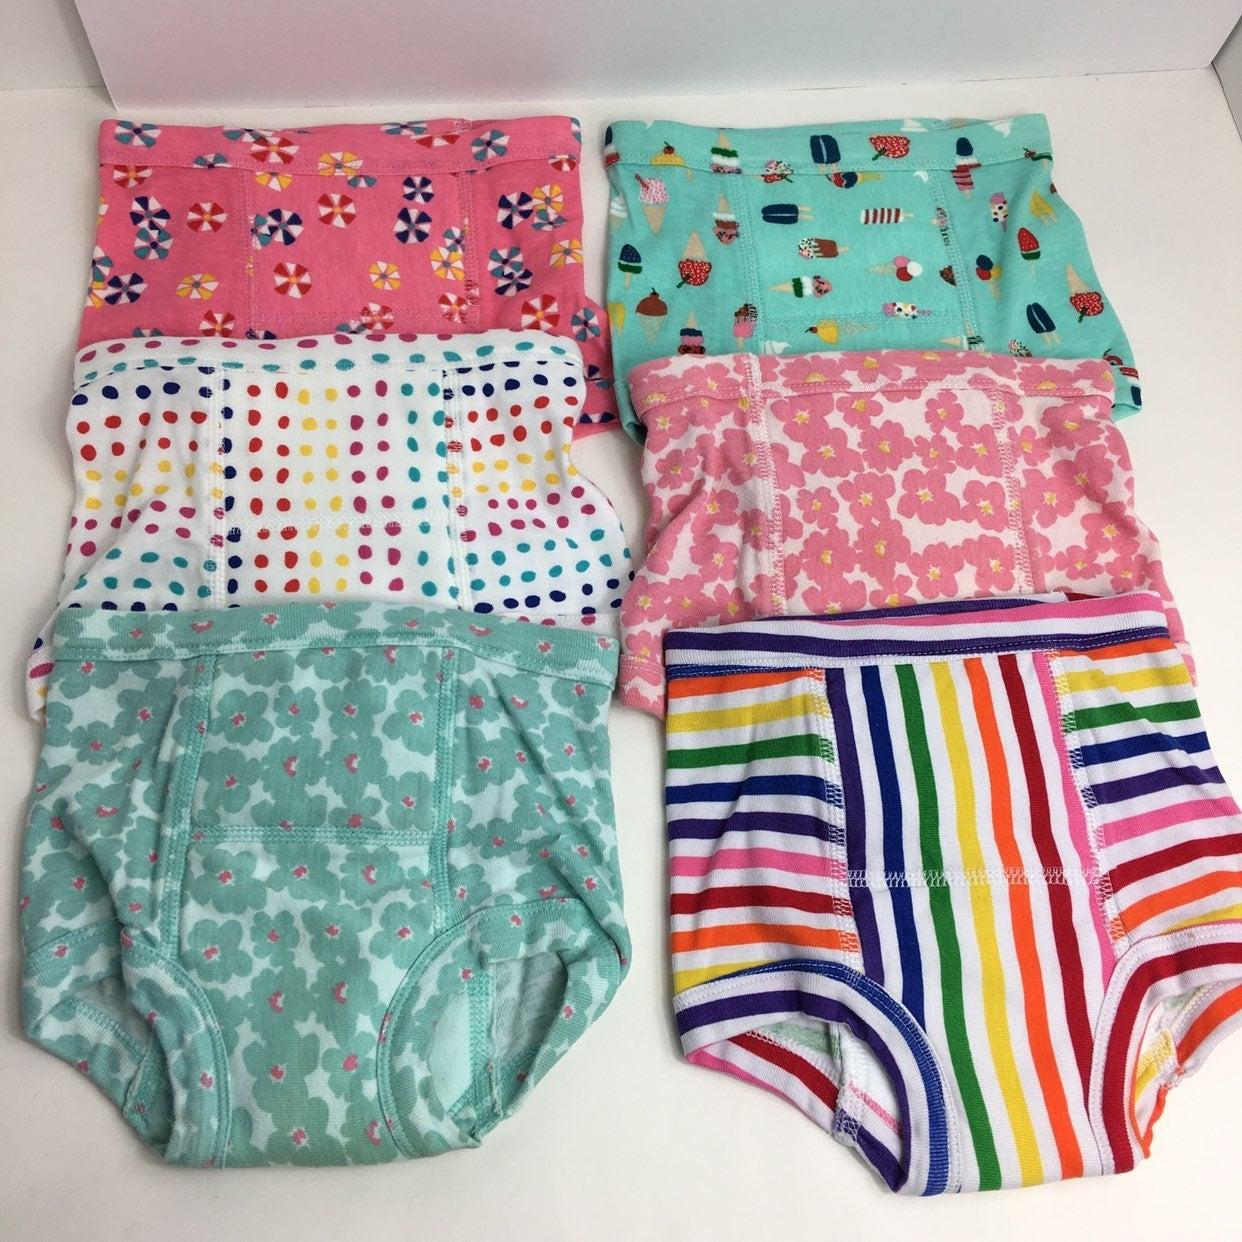 Hanna Andersson Girls Training Pants XS